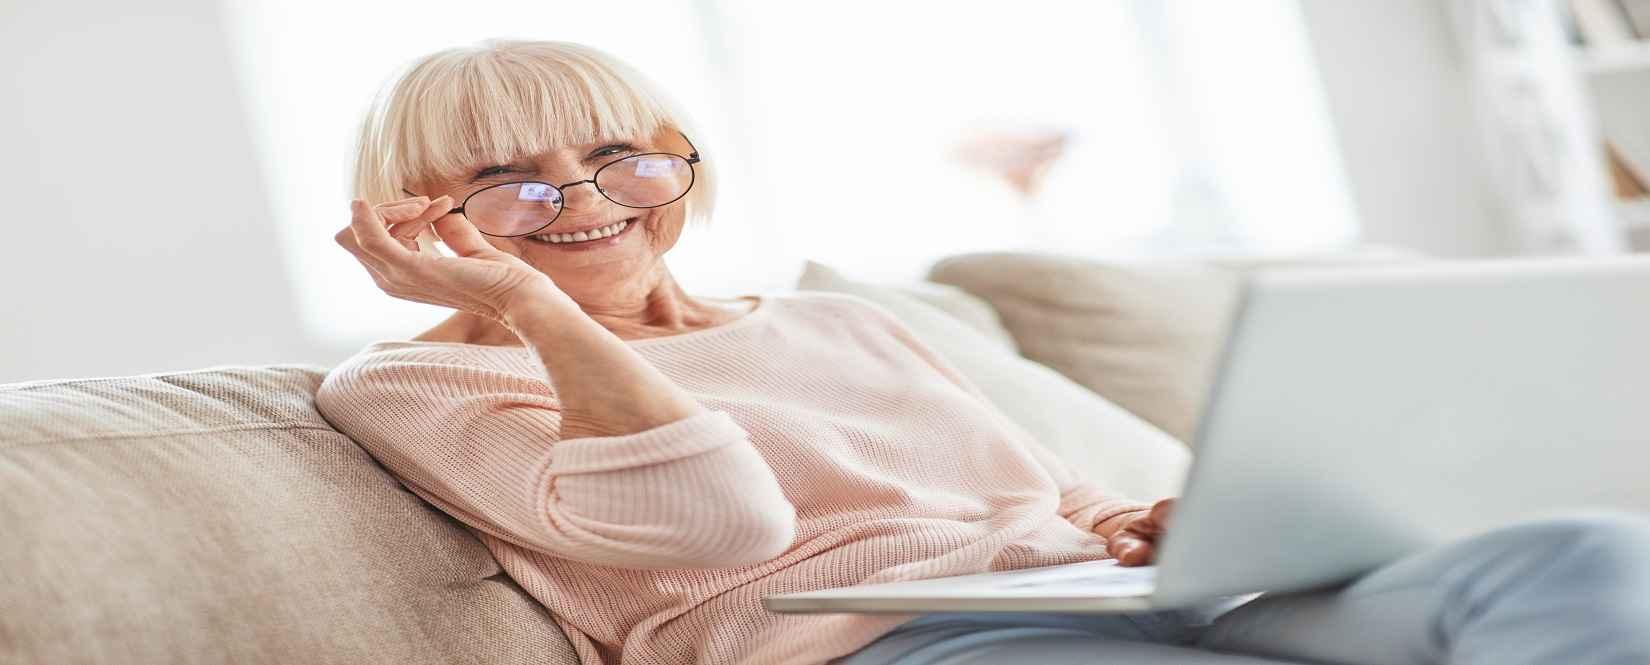 Life Insurance In Retirement 2021